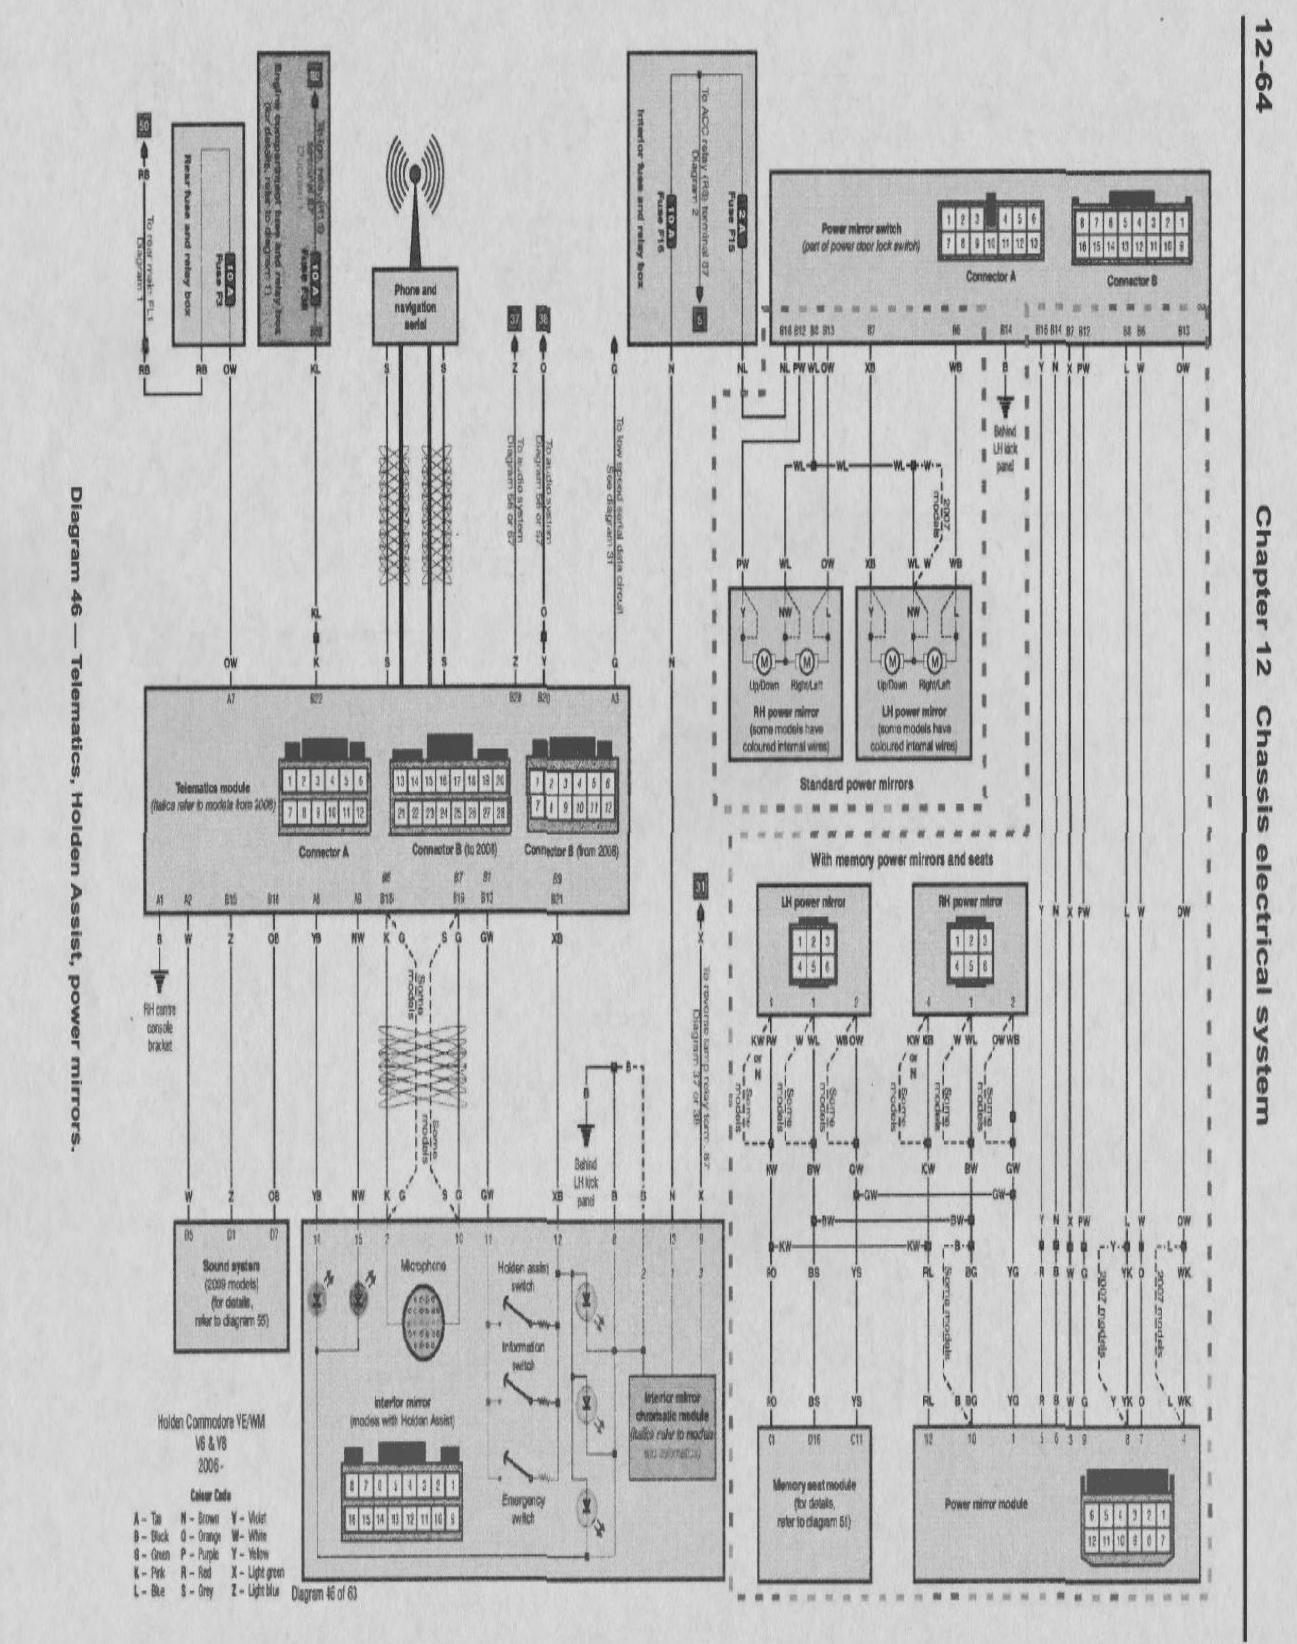 Vt Commodore Pcm Wiring Diagram